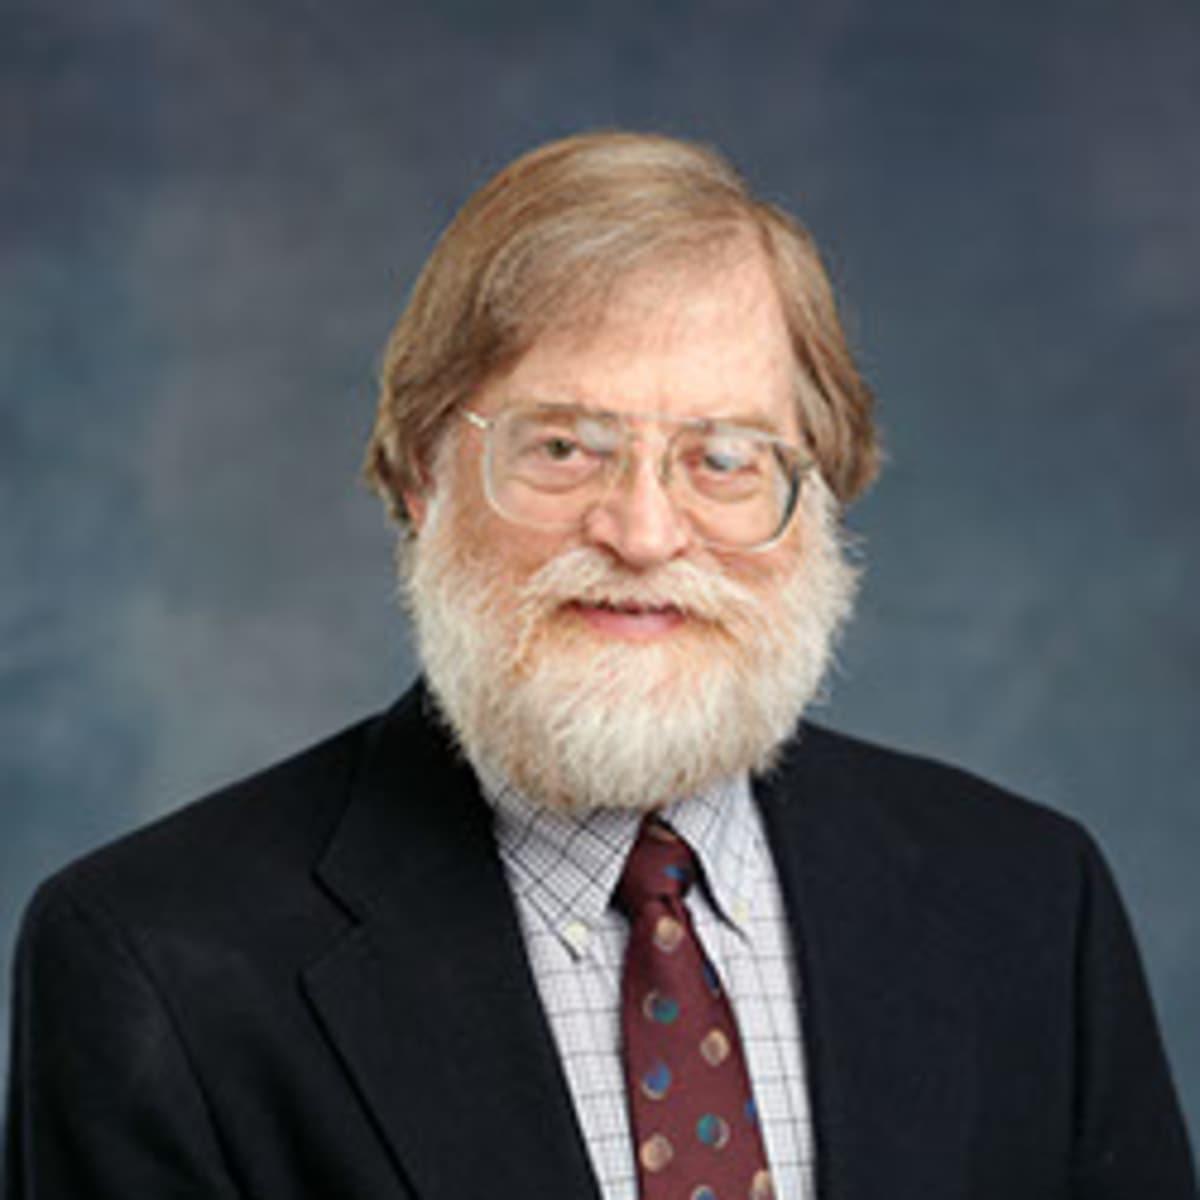 Dr. James Eskew, MD - Reviews - Austin, TX - Healthgrades